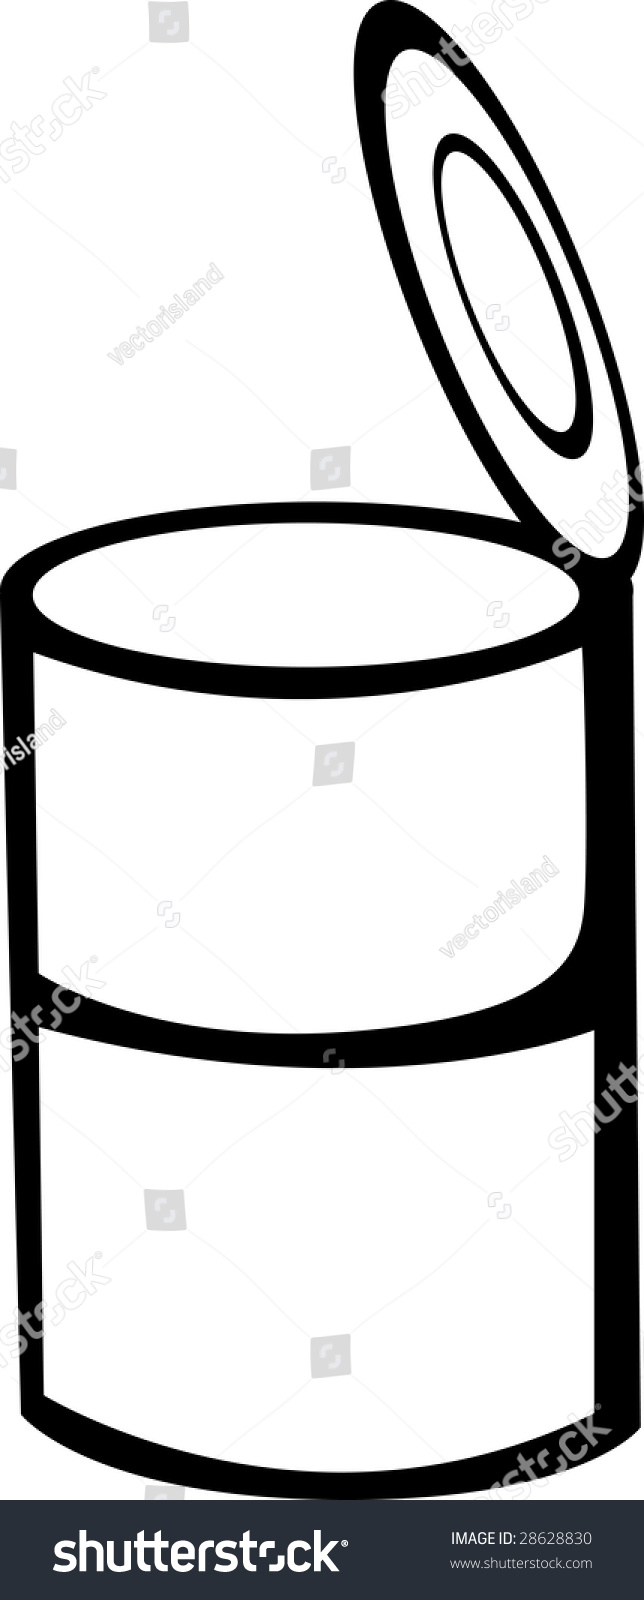 Soup Can Clip Art - dothuytinh